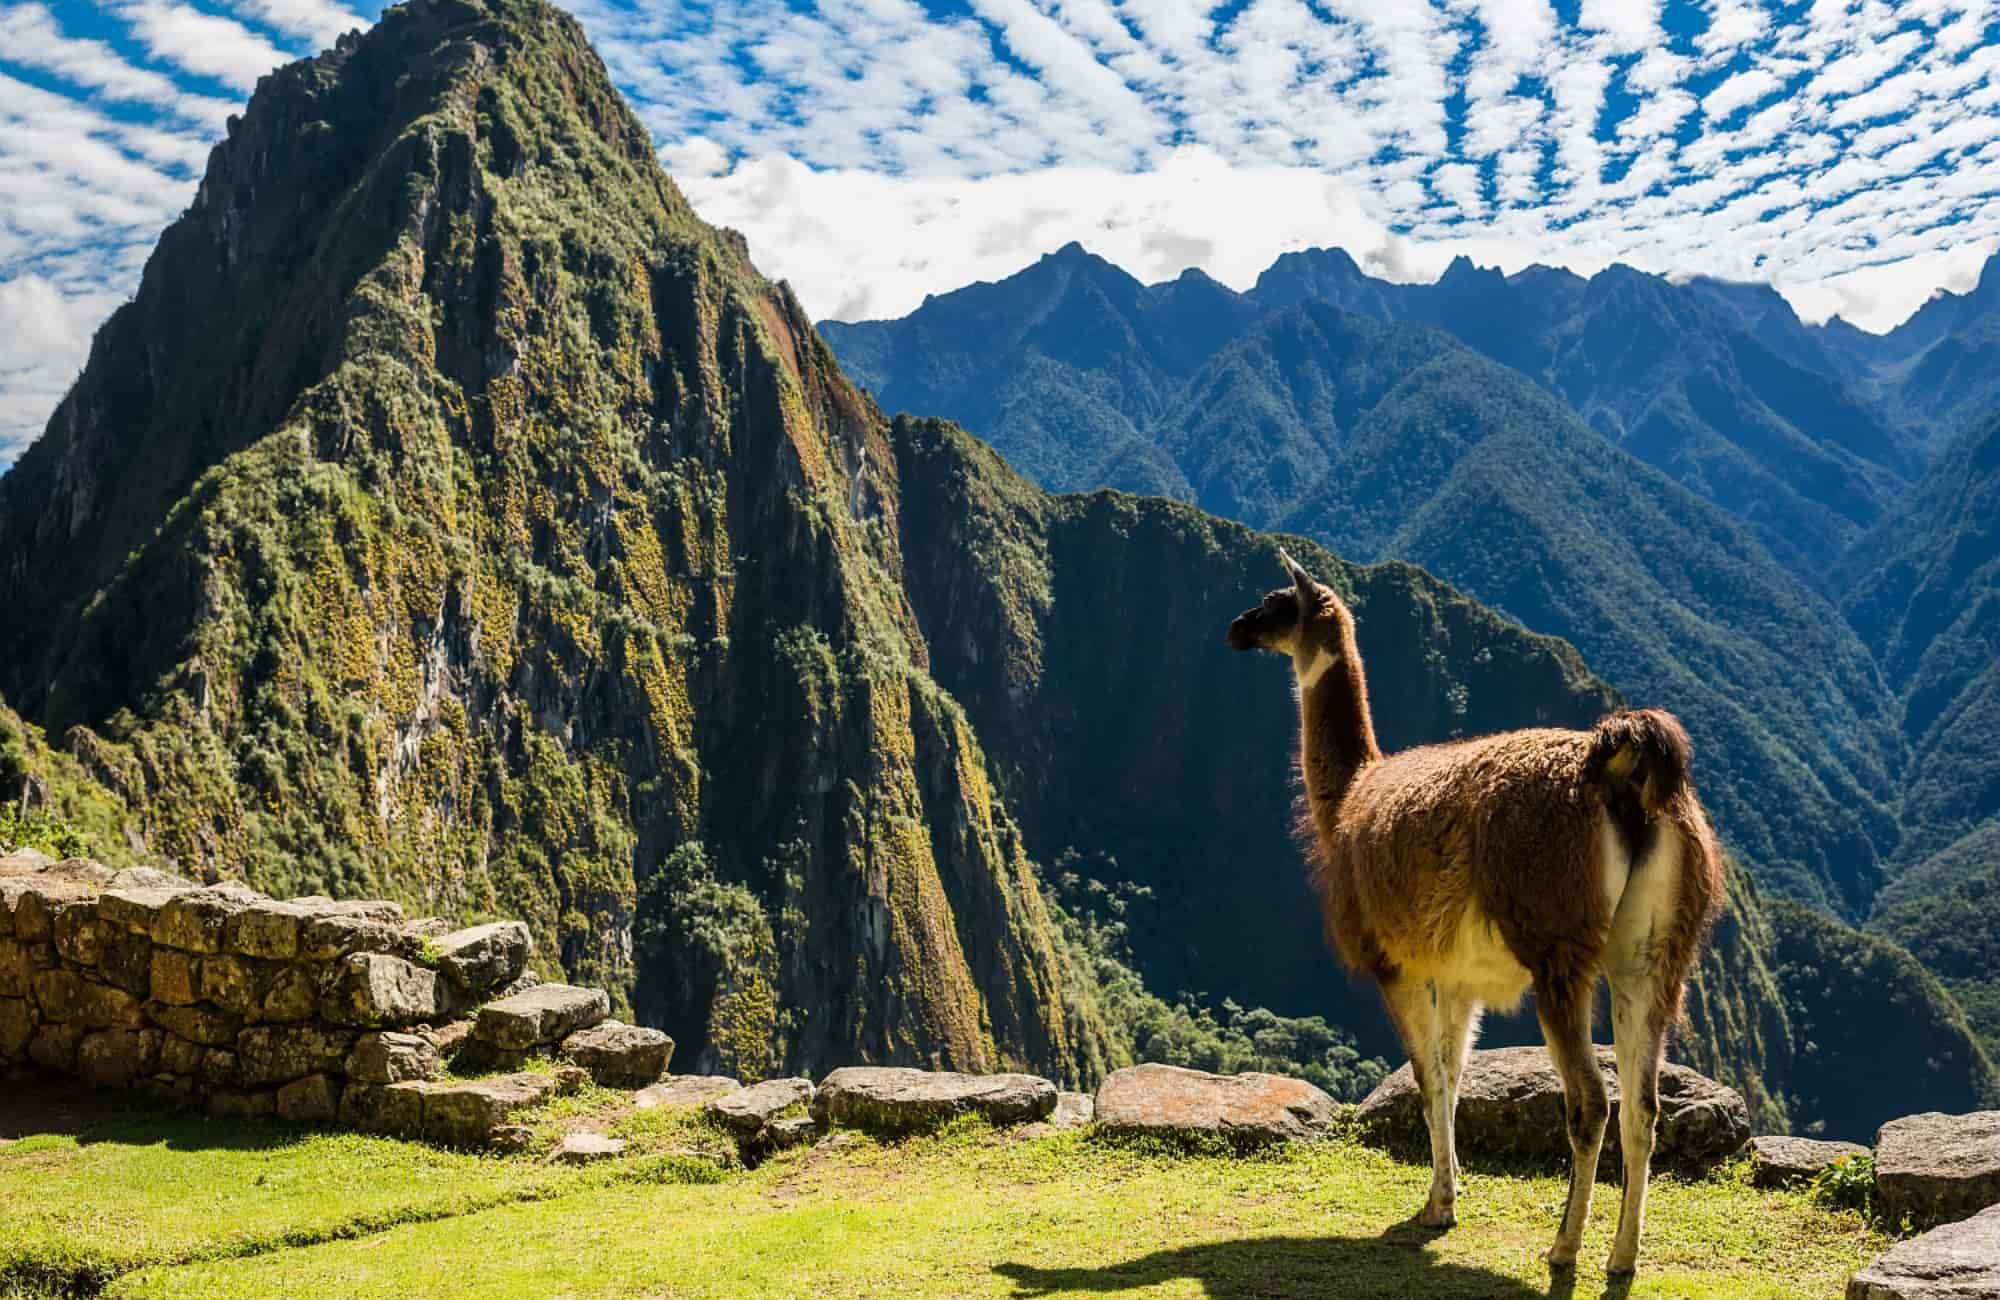 Voyage Pérou - Lama au Machu Picchu - Amplitudes